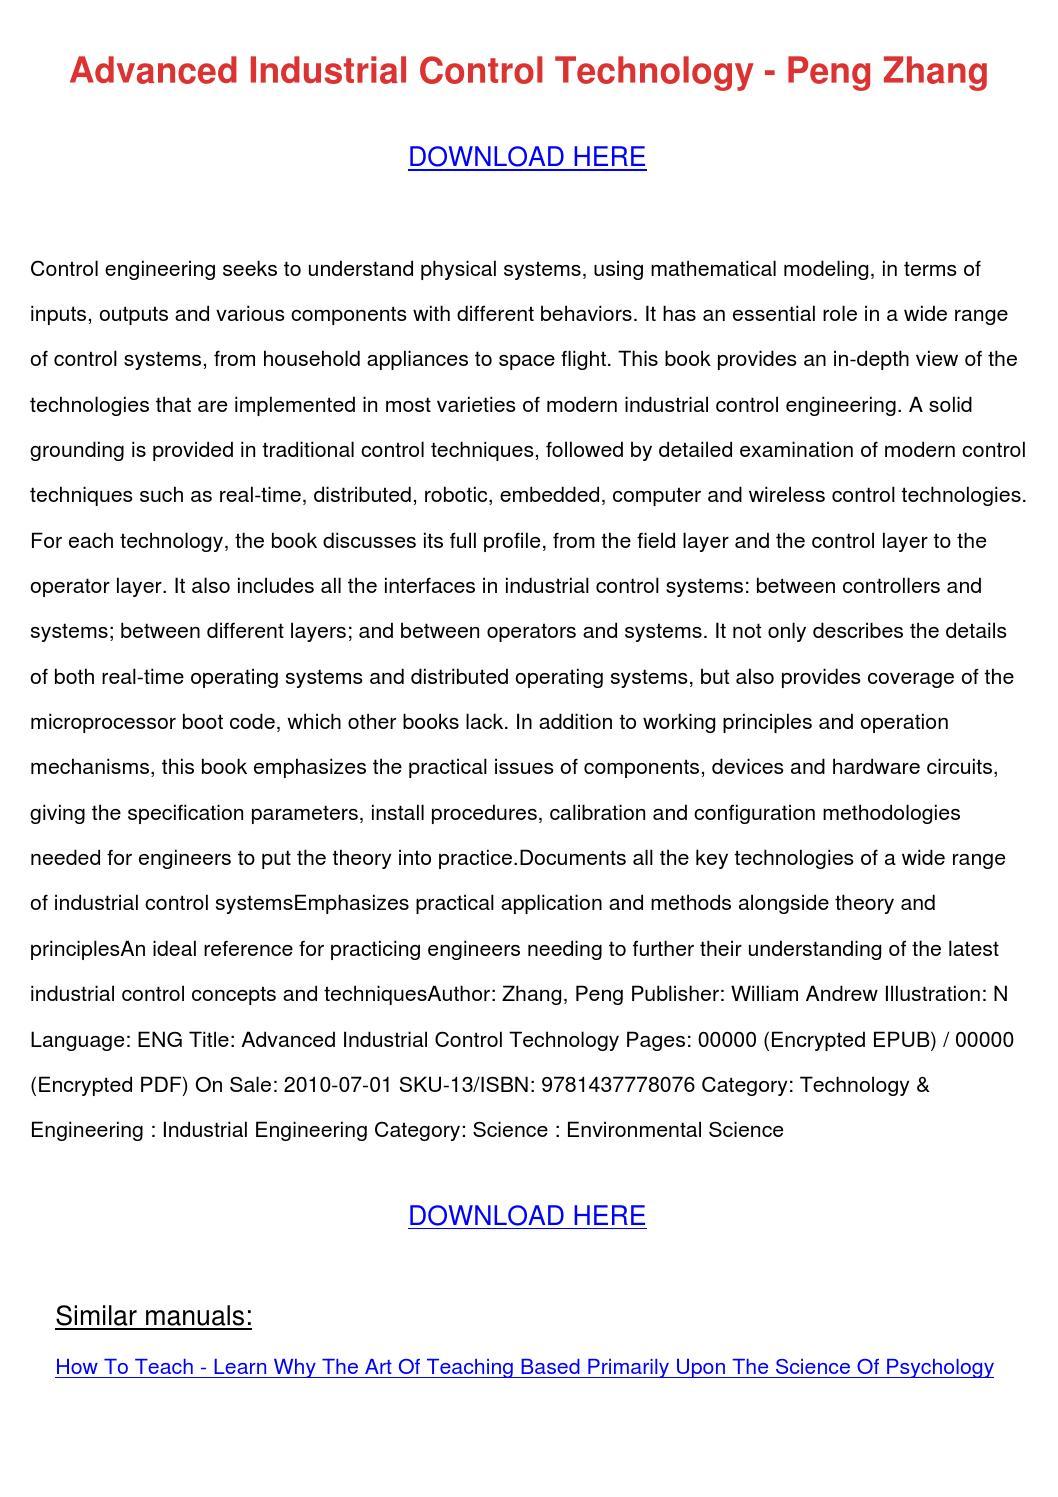 Advanced Industrial Control Technology Peng Z by LisaLeblanc - issuu